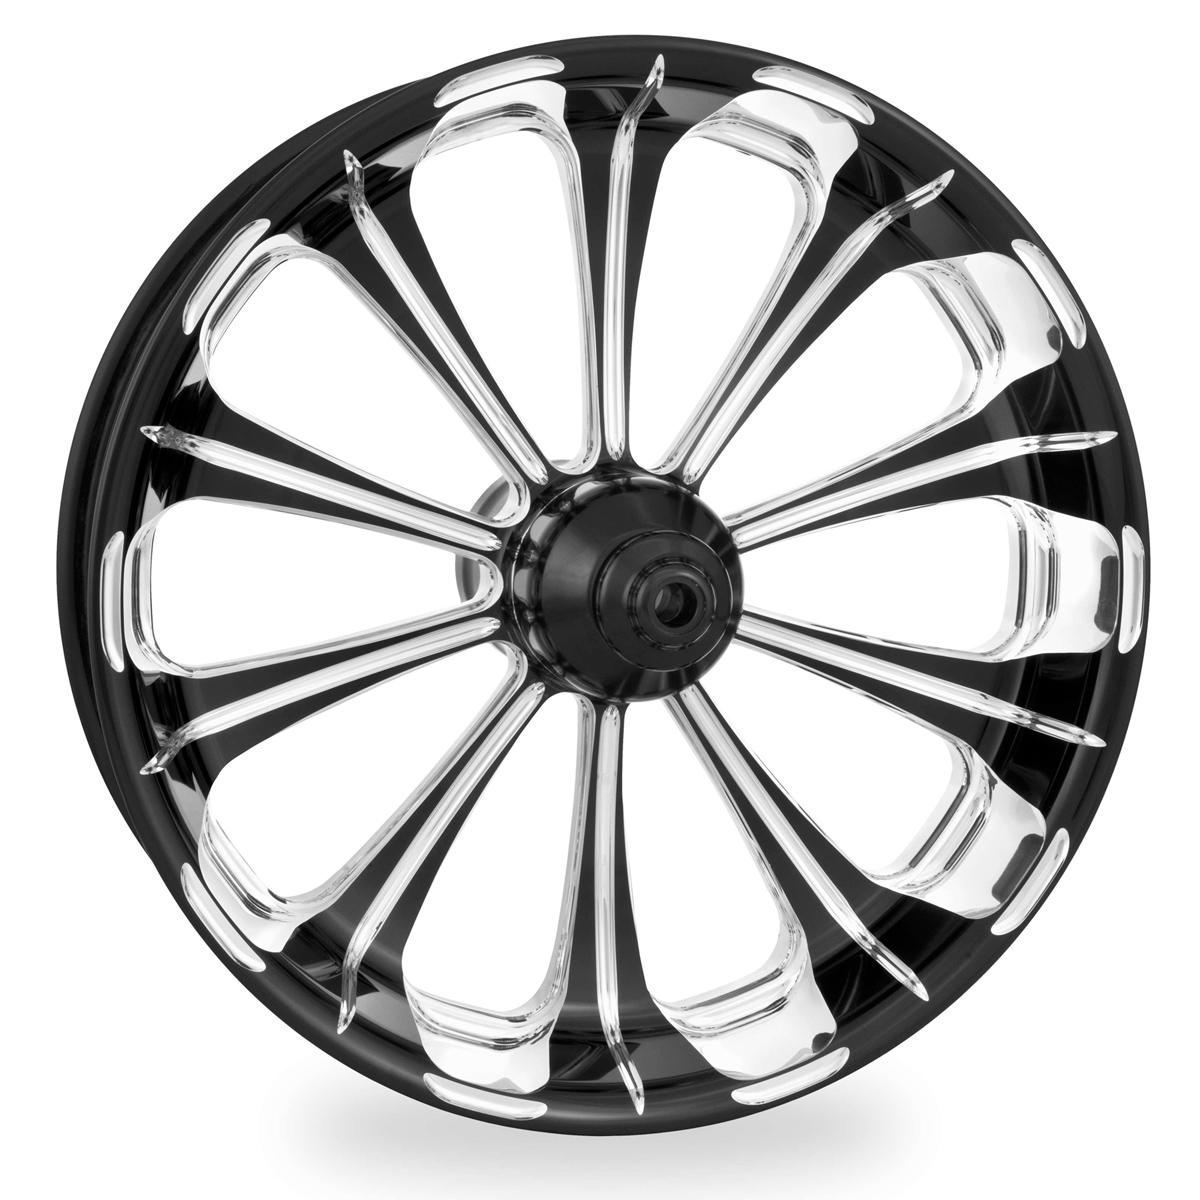 Performance Machine Revel Platinum Cut Rear Wheel 18x5.5 ABS